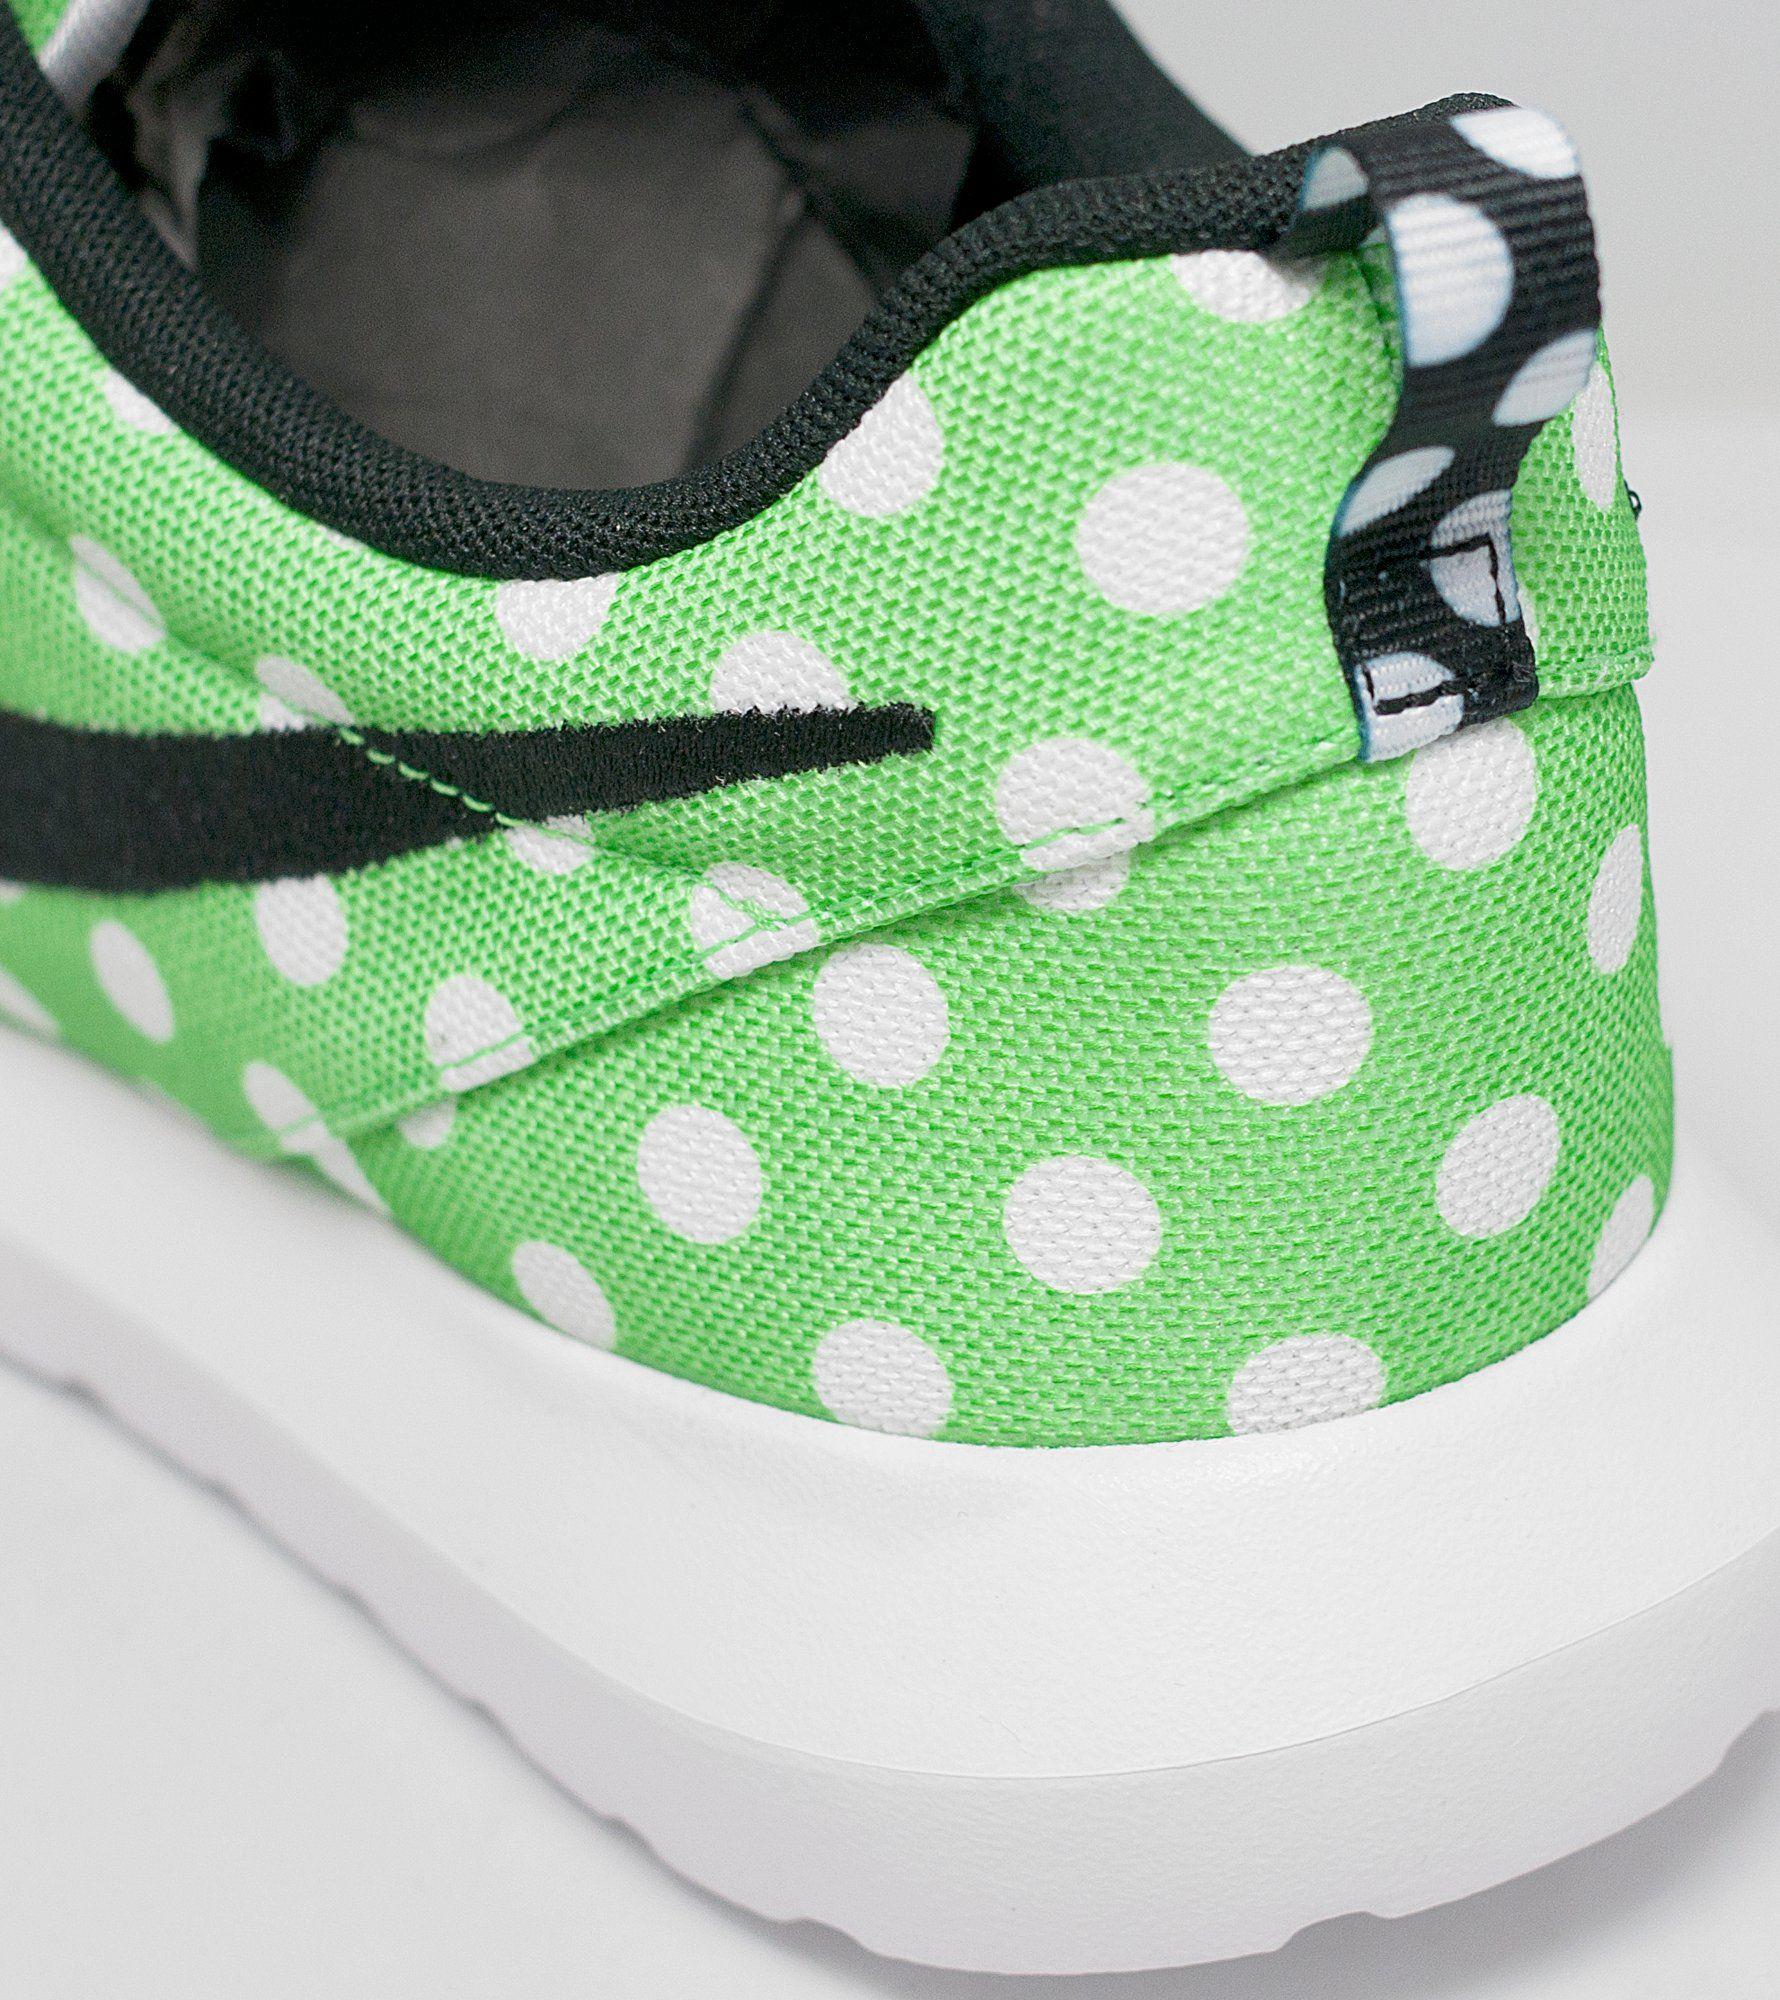 jfrem Nike Roshe One NM QS 'Polkadot Pack' | Size?